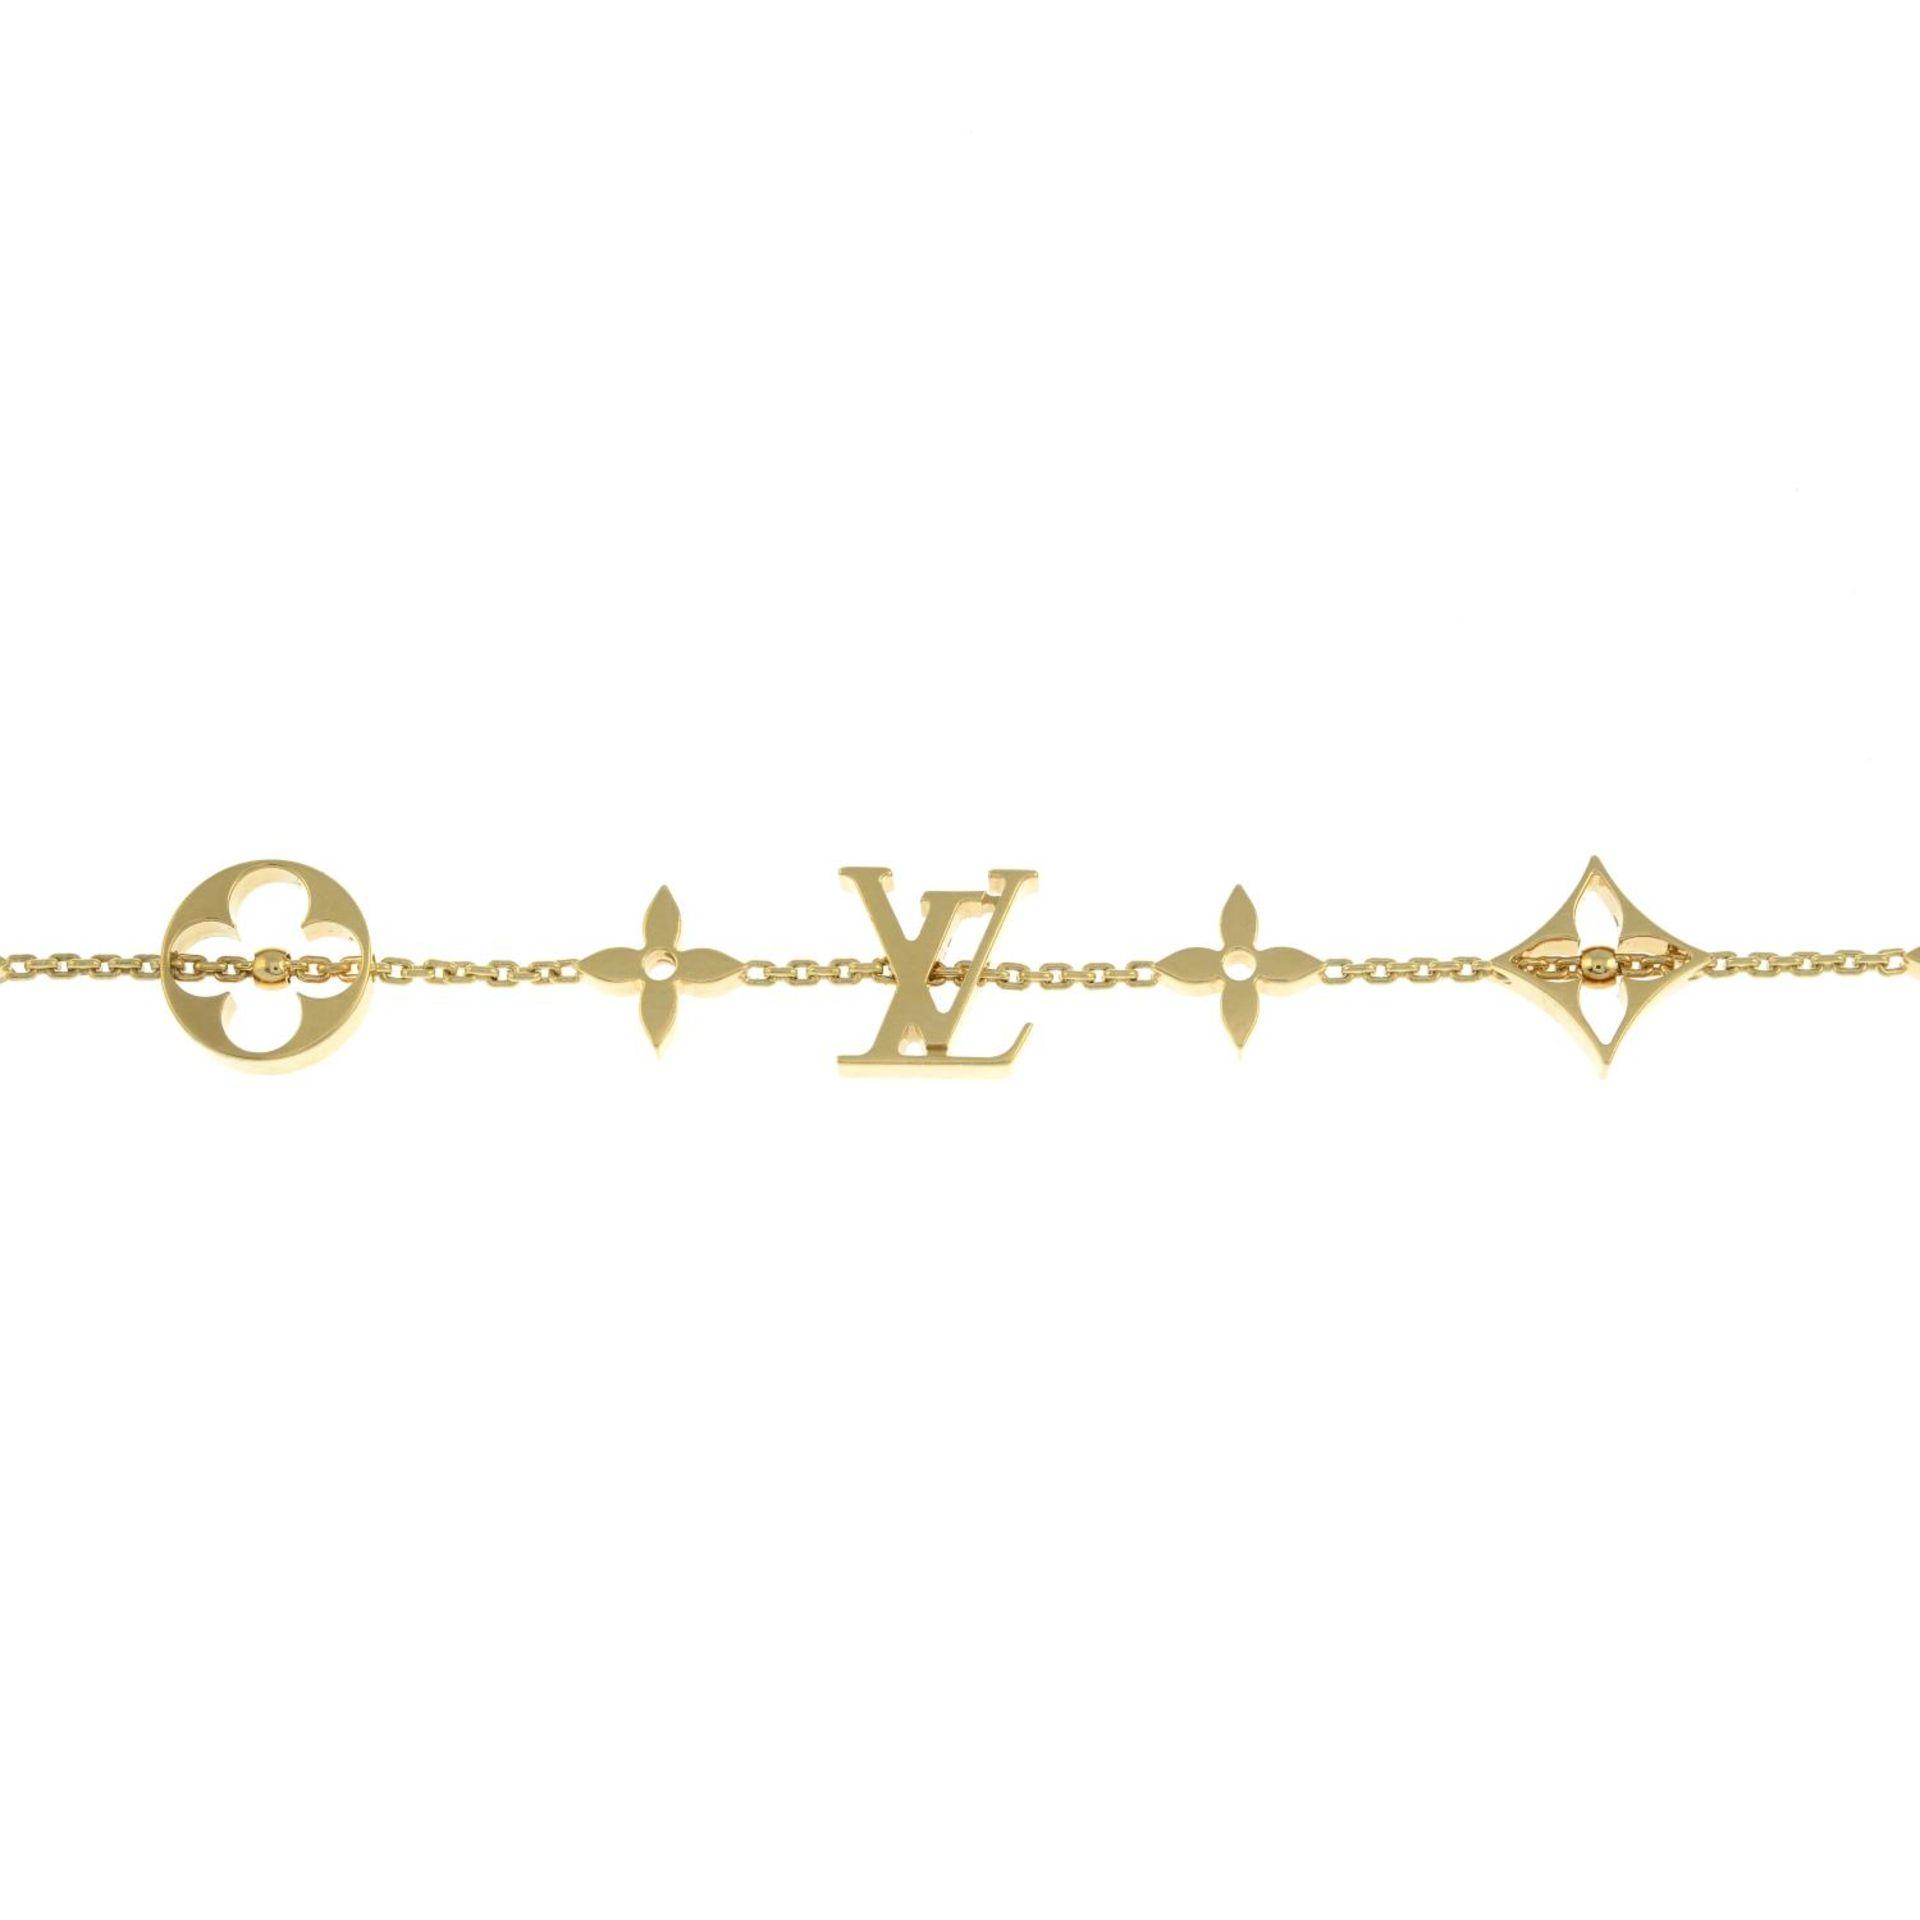 An 'Idylee Blossom Monogram' bracelet, - Image 2 of 4